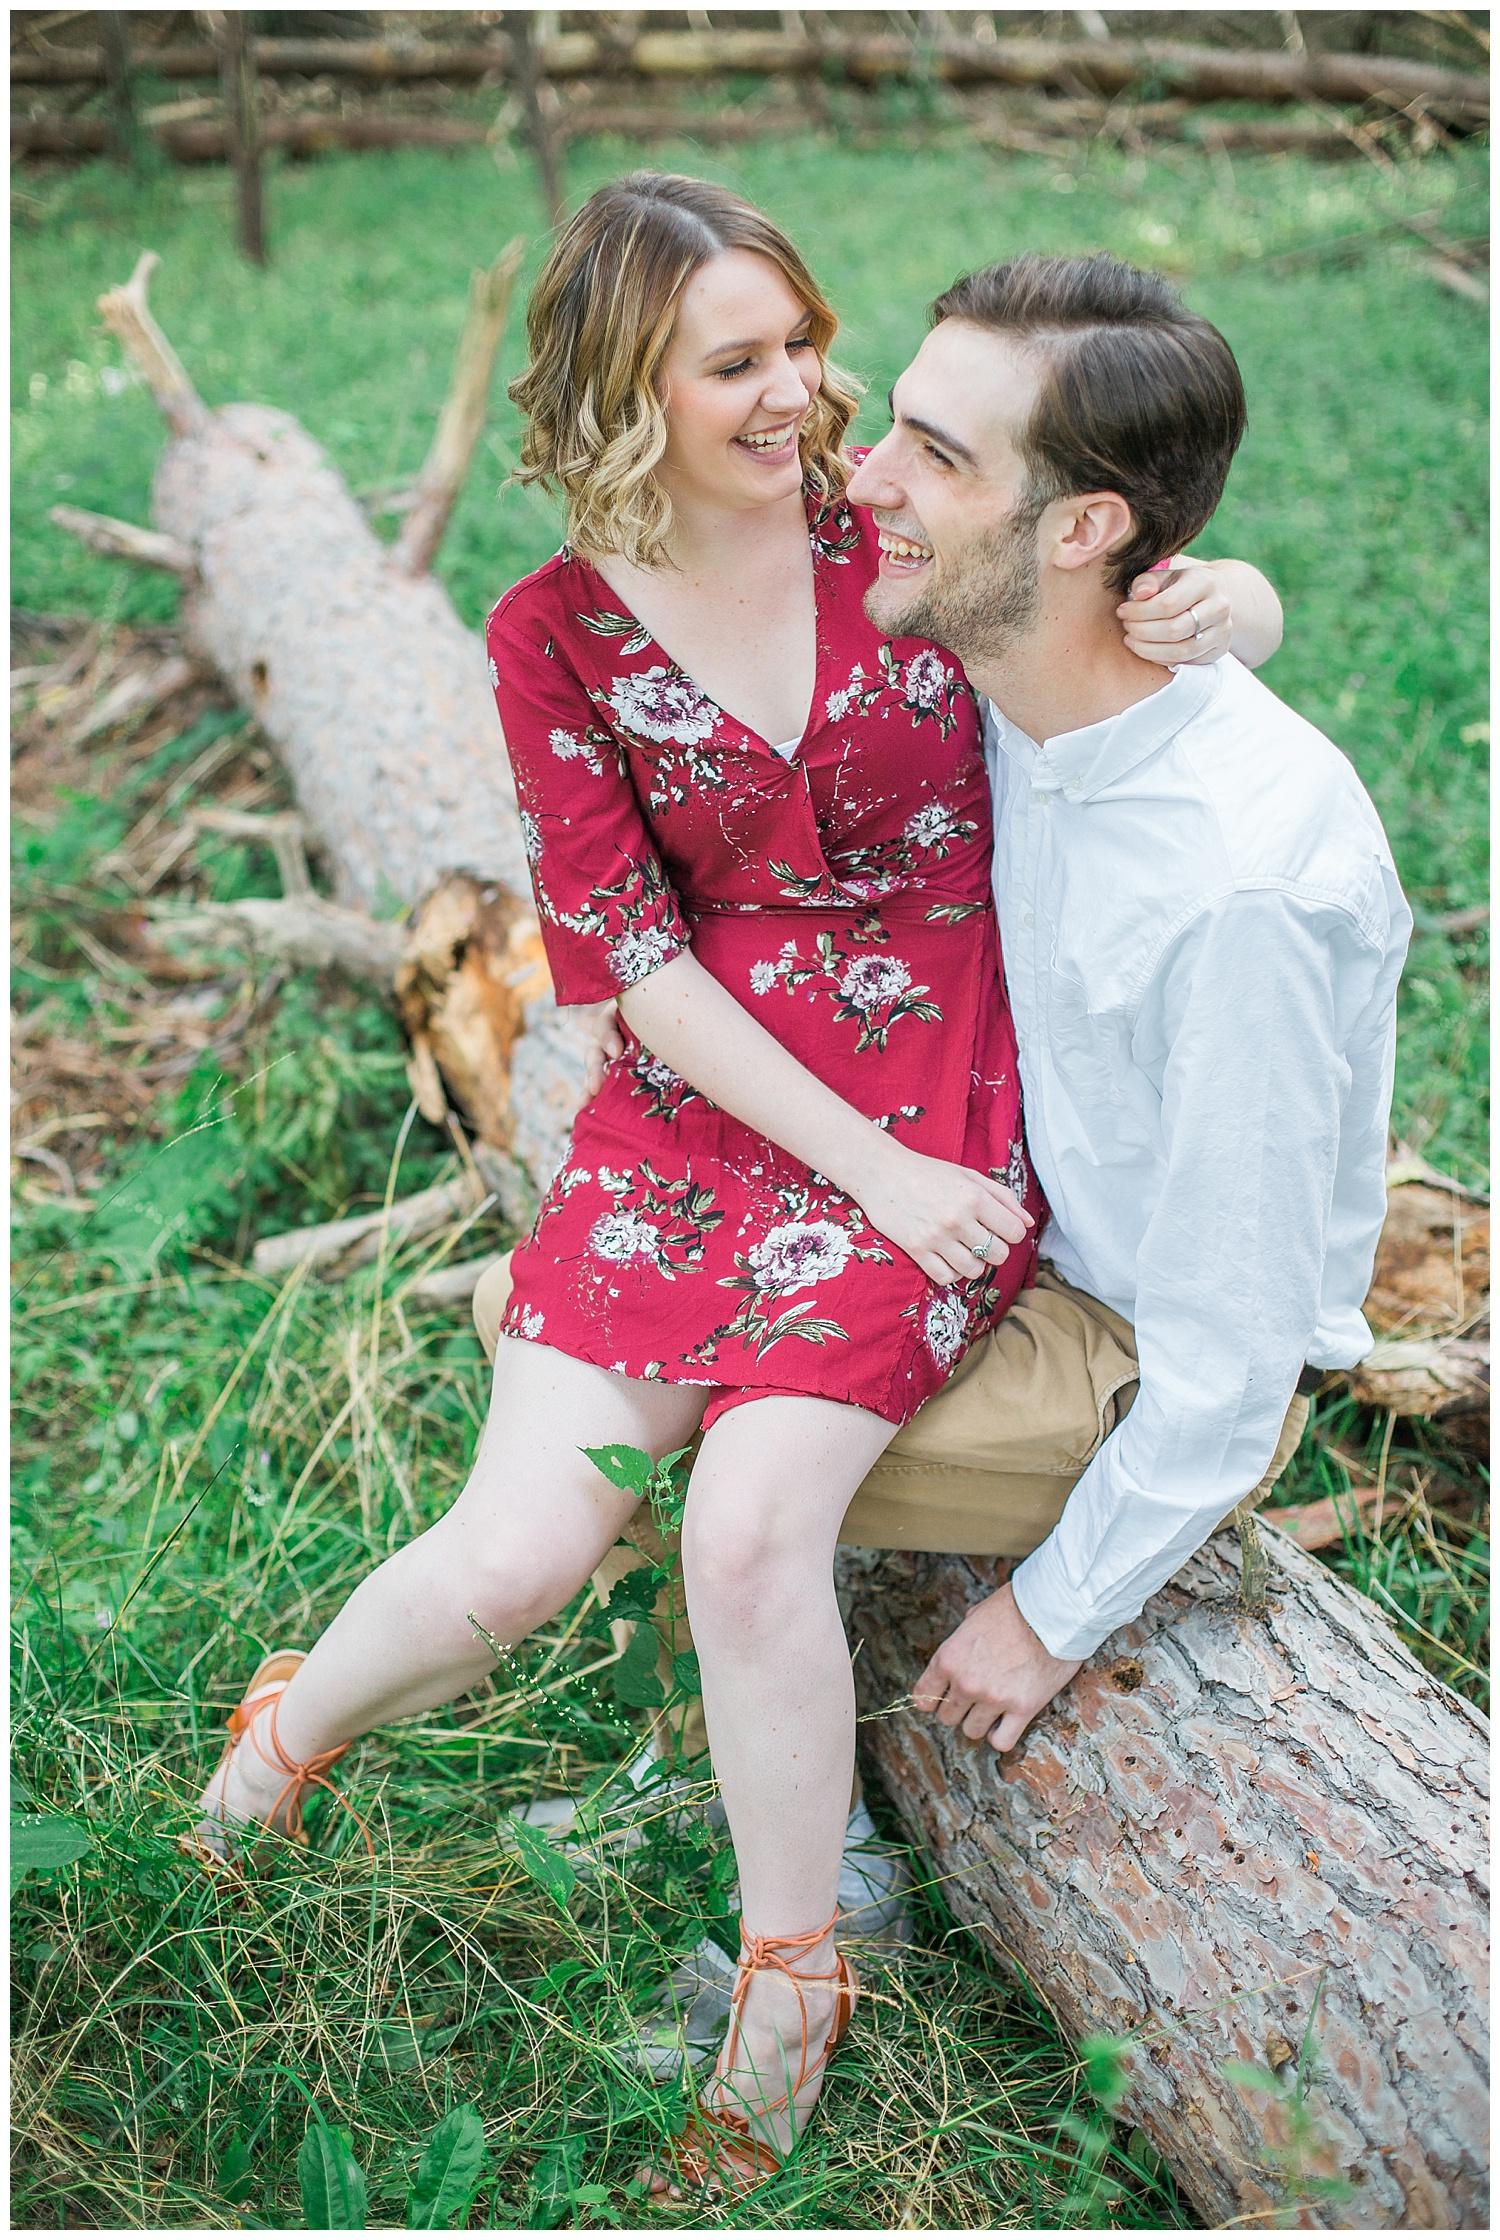 Tanya and Ryan - Sweetheart session - Lass & Beau - Geneseo NY-83_Buffalo wedding photography.jpg